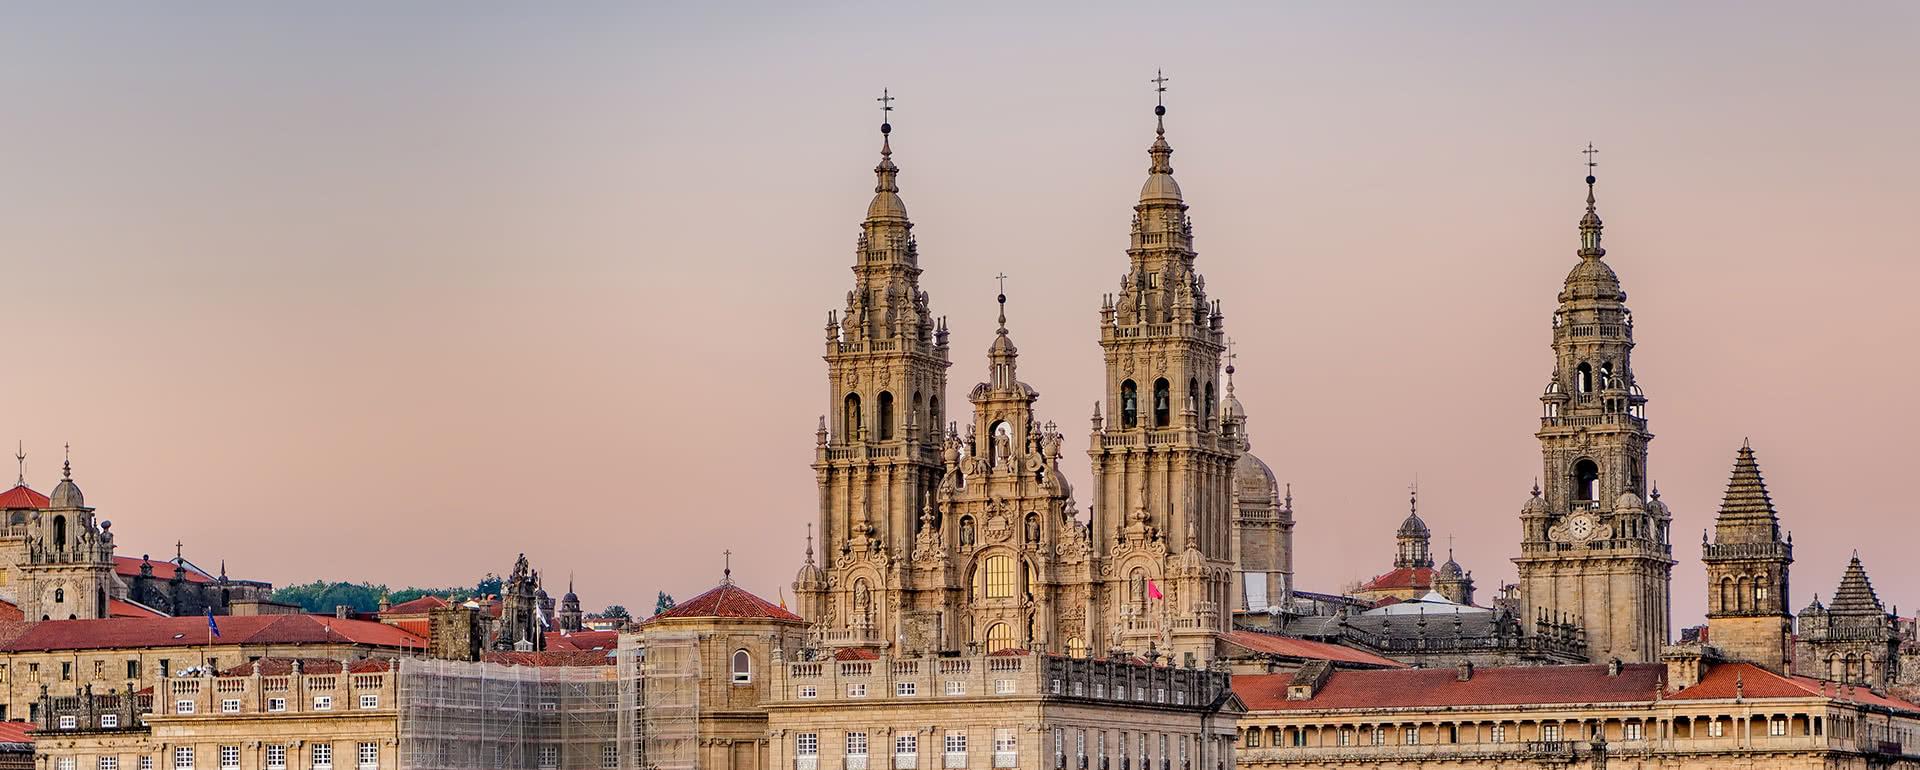 Titelbild von Santiago de Compostela